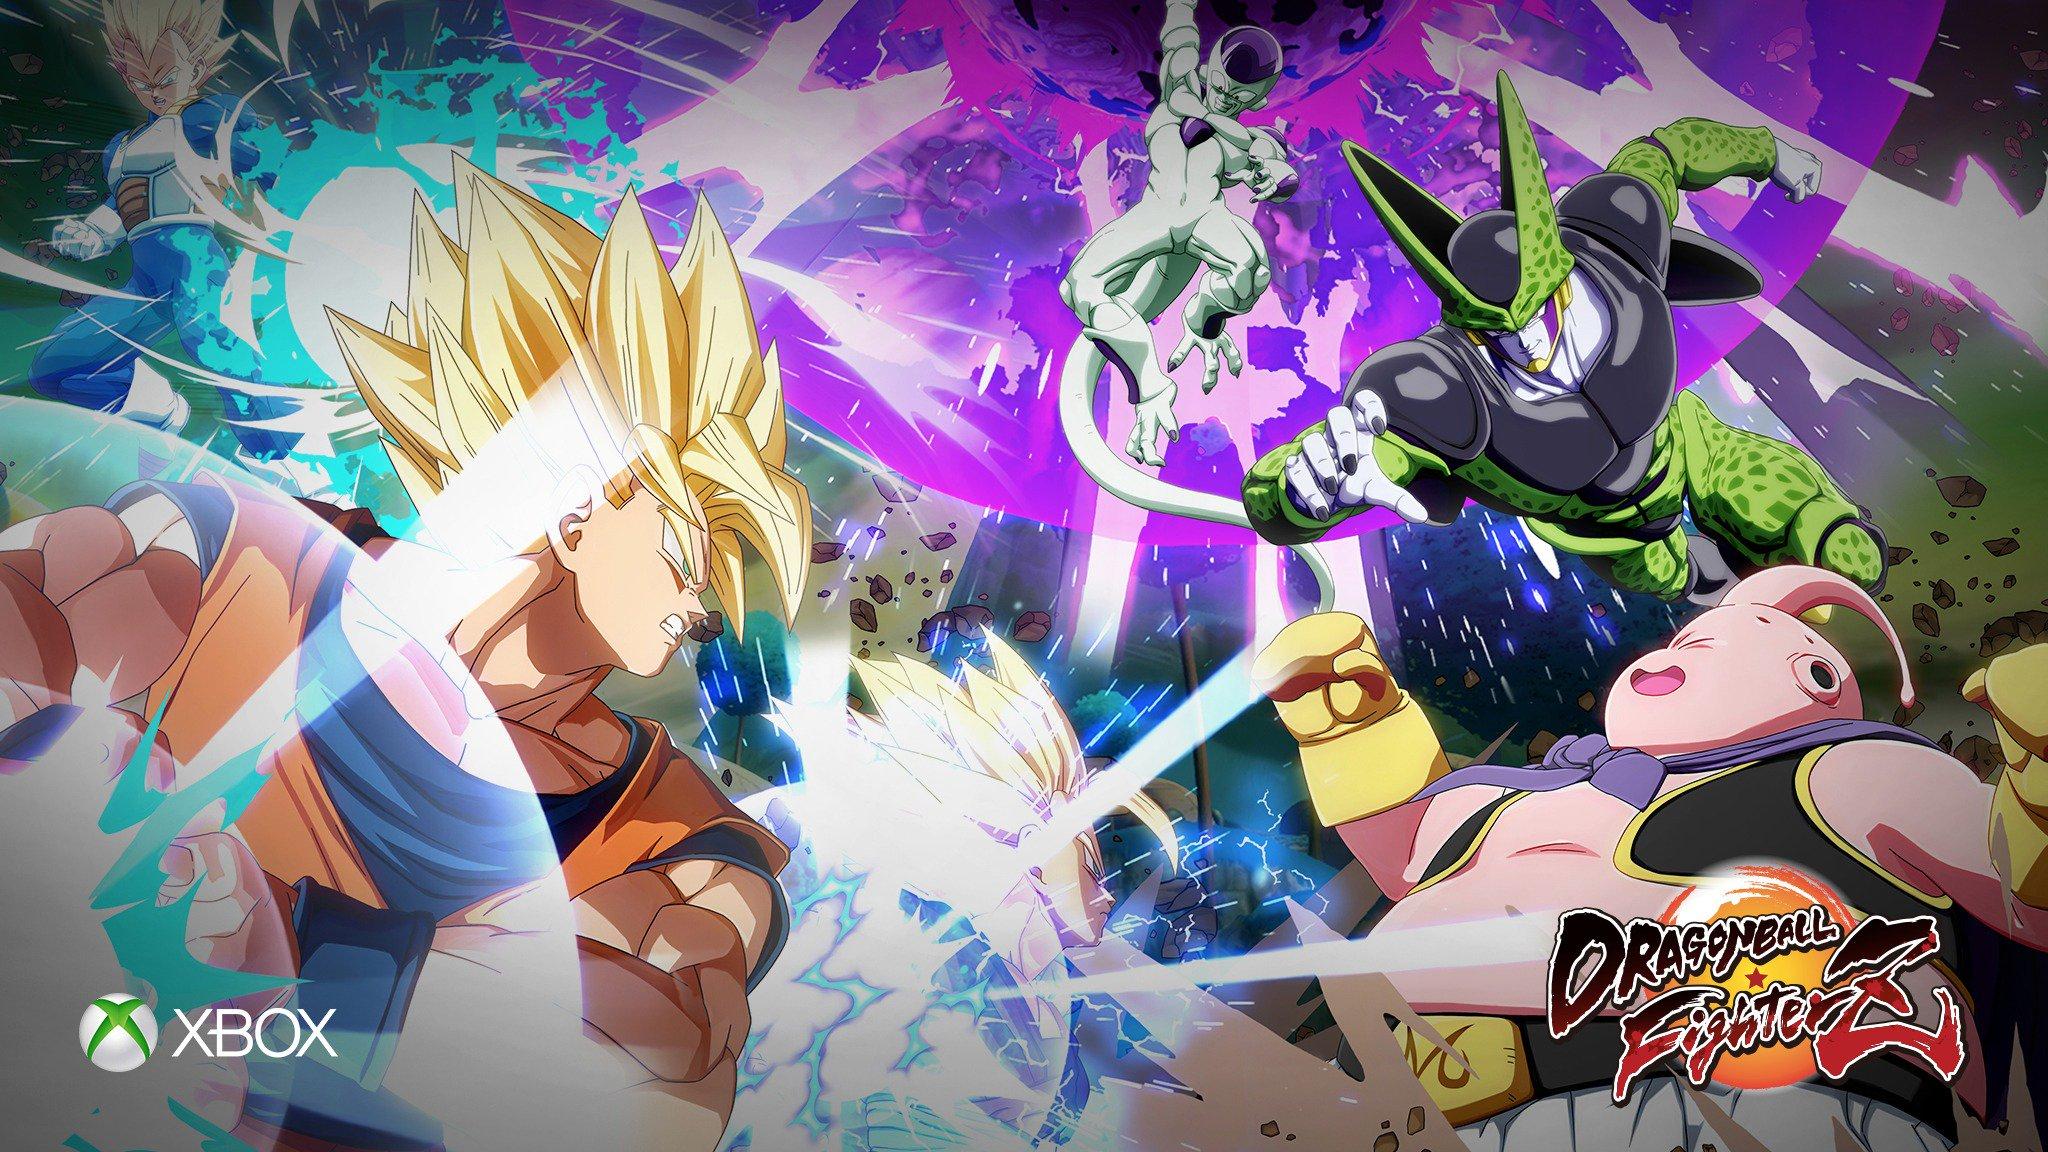 That Dragon Ball FighterZ video looks so dang good screenshot